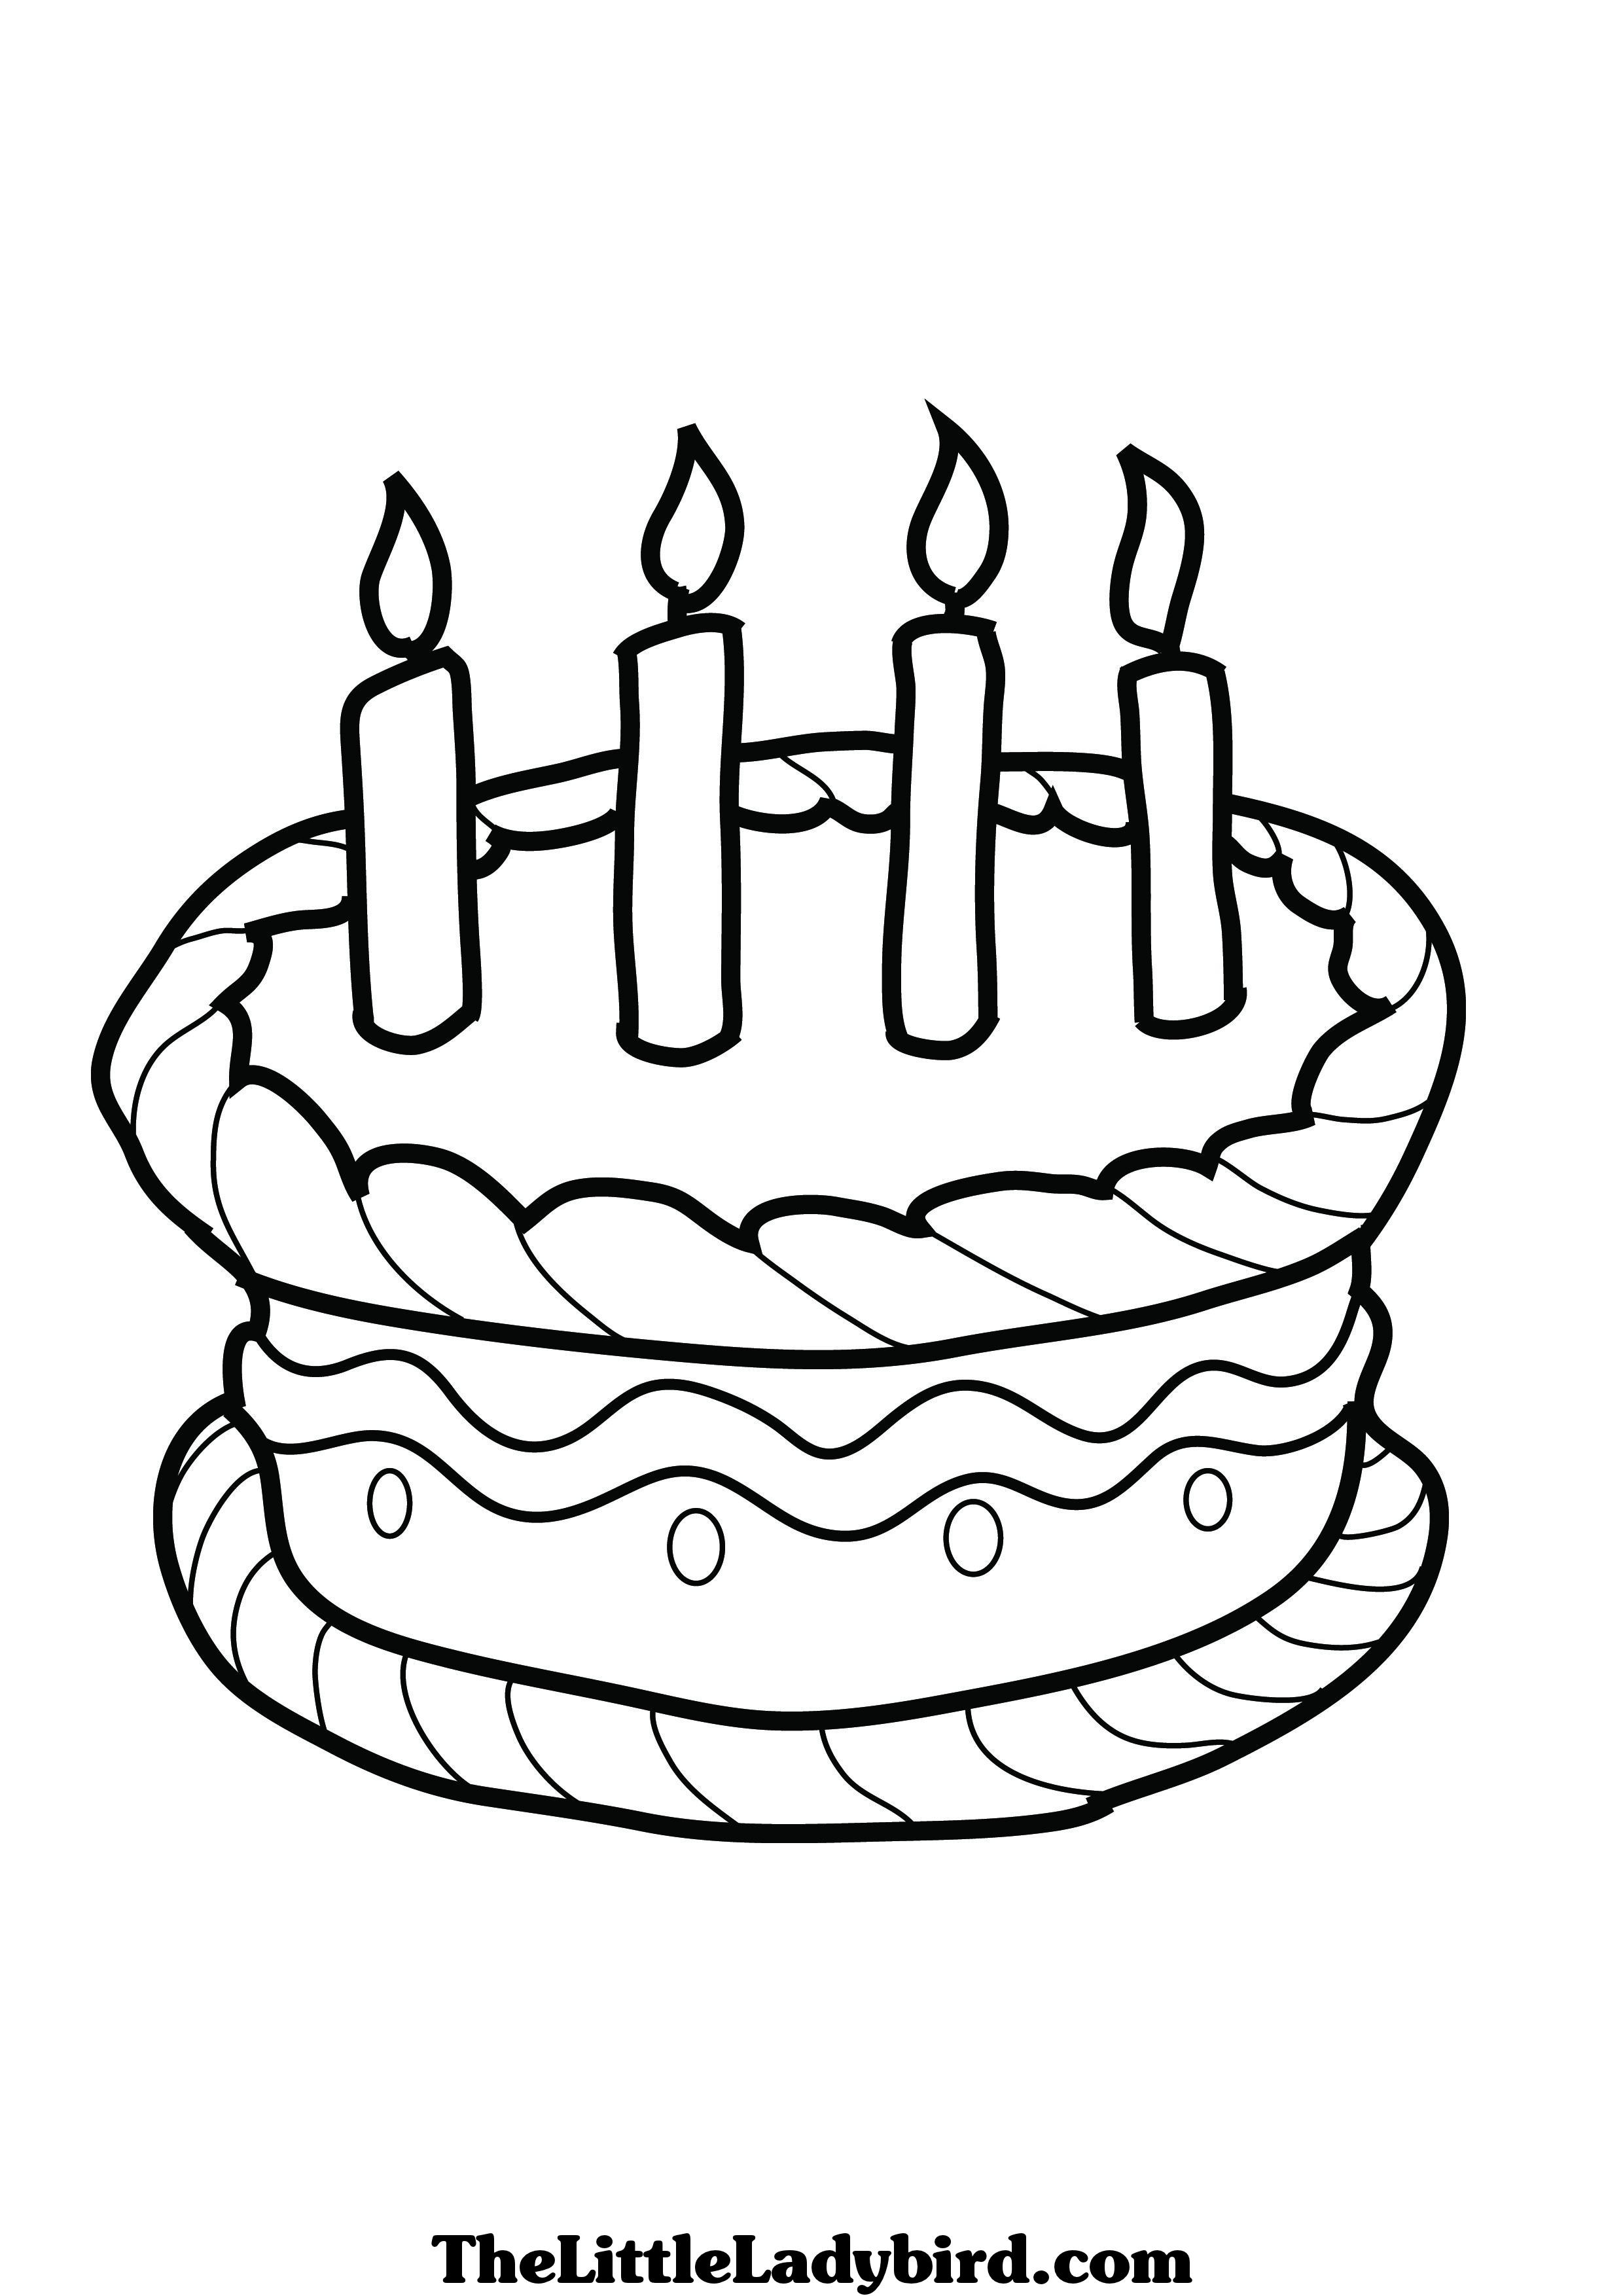 Birthday Cake Line Drawing At Getdrawings